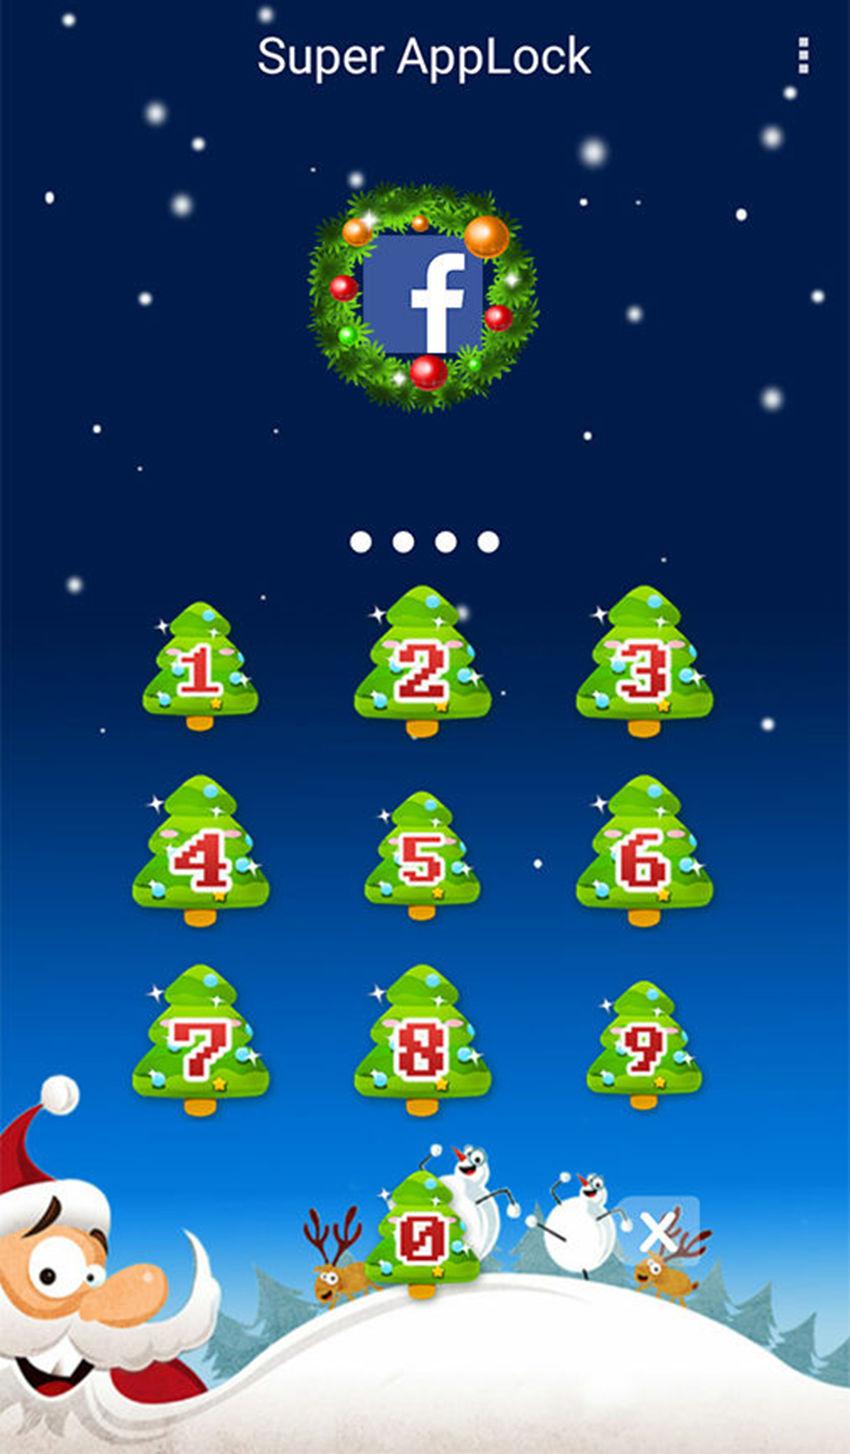 AppLock Theme Xmas Gift Wish Screenshot 1